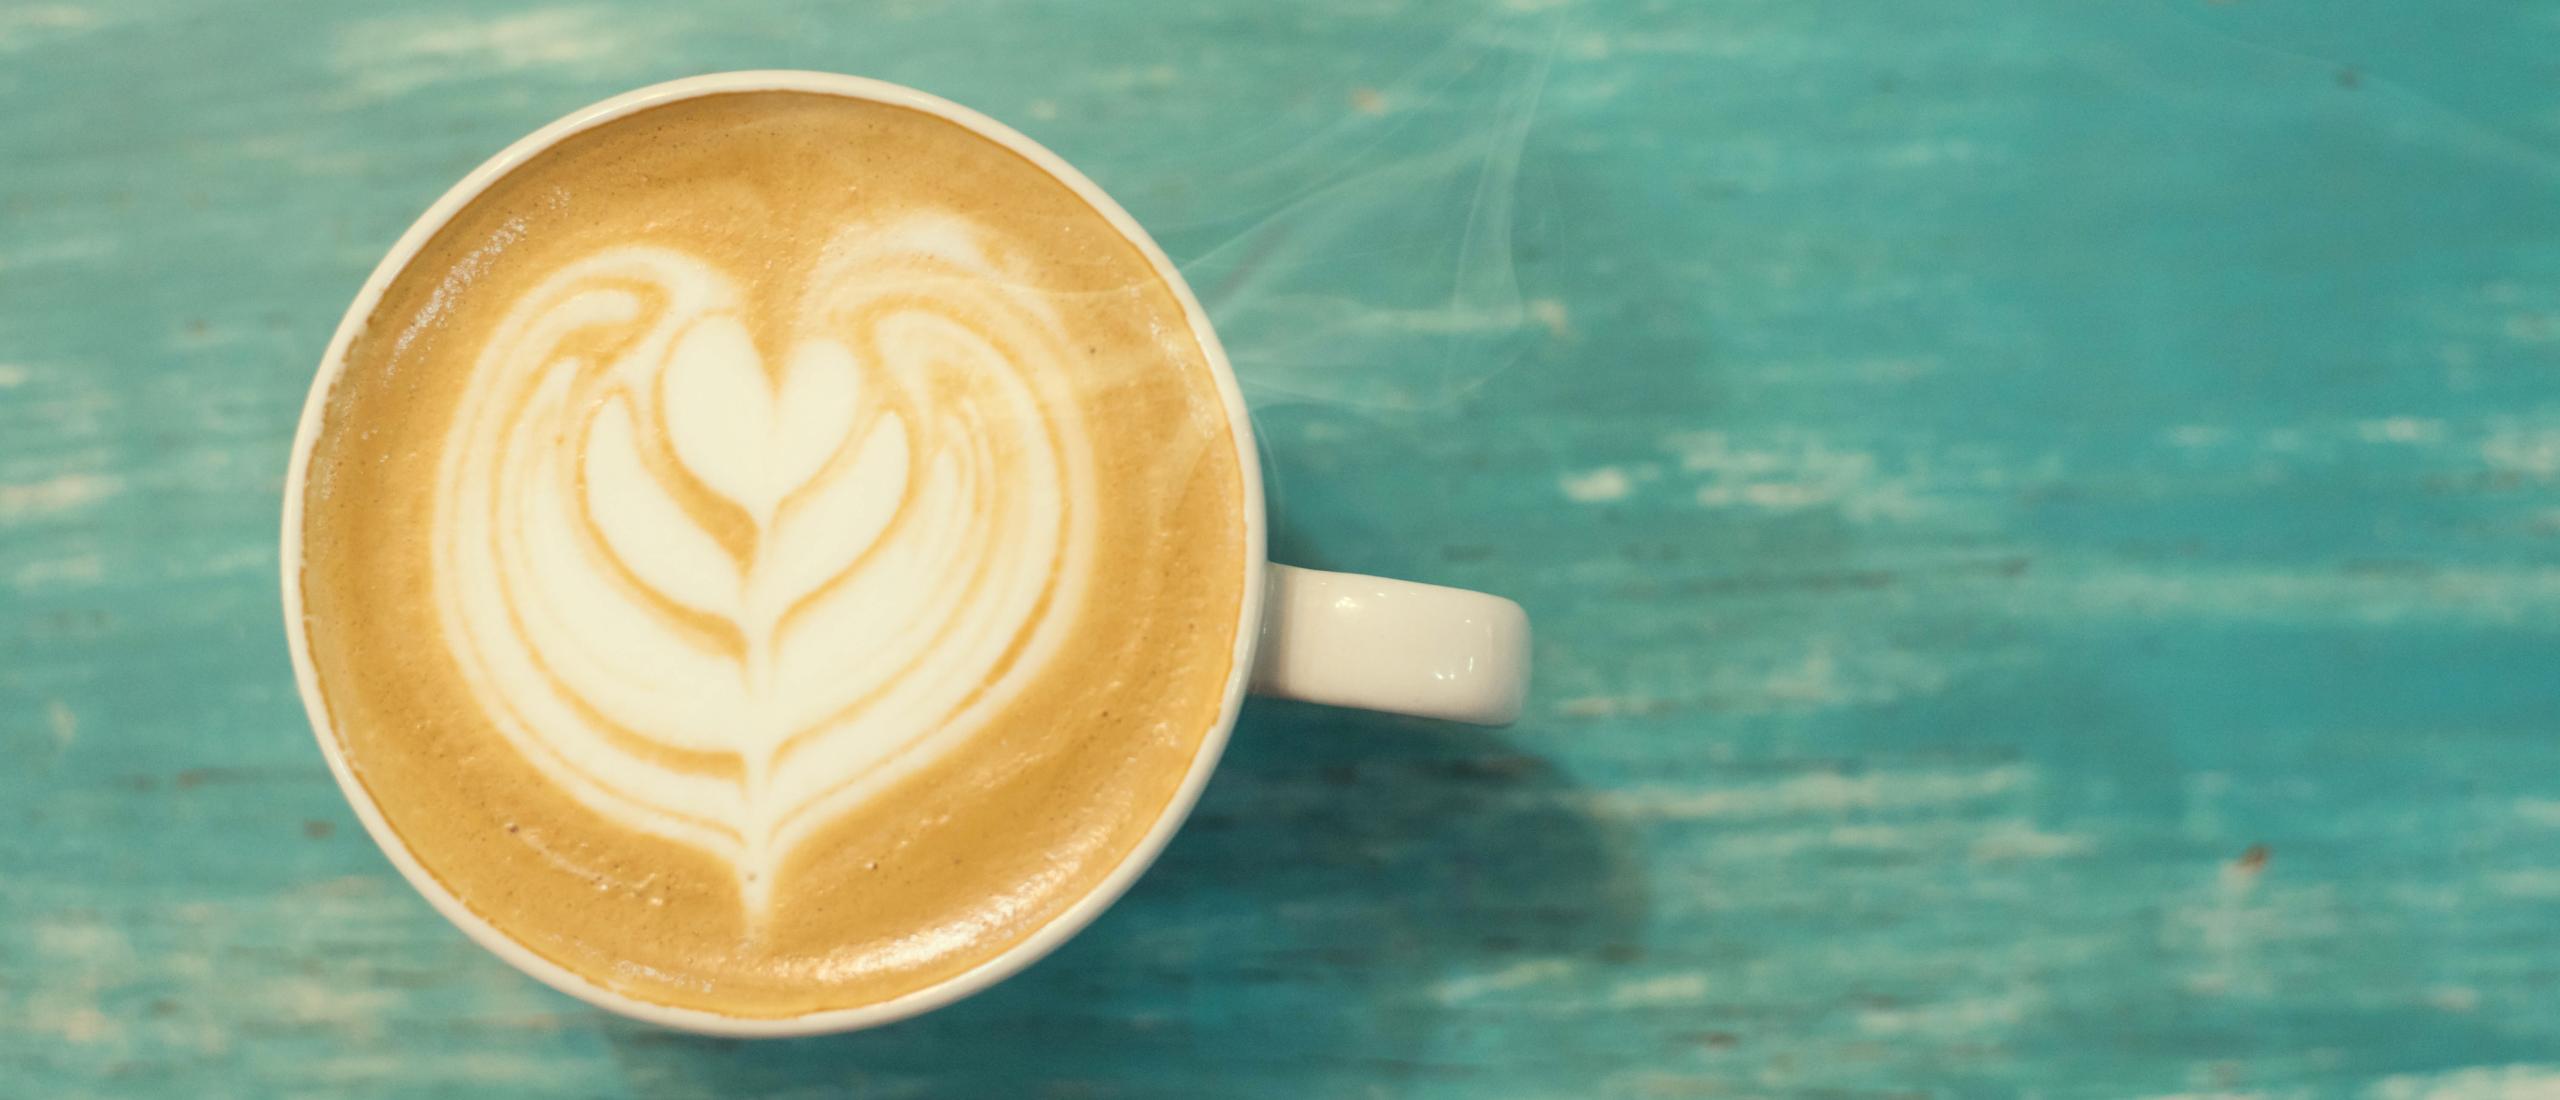 5 x waarom een decaf koffiemerk